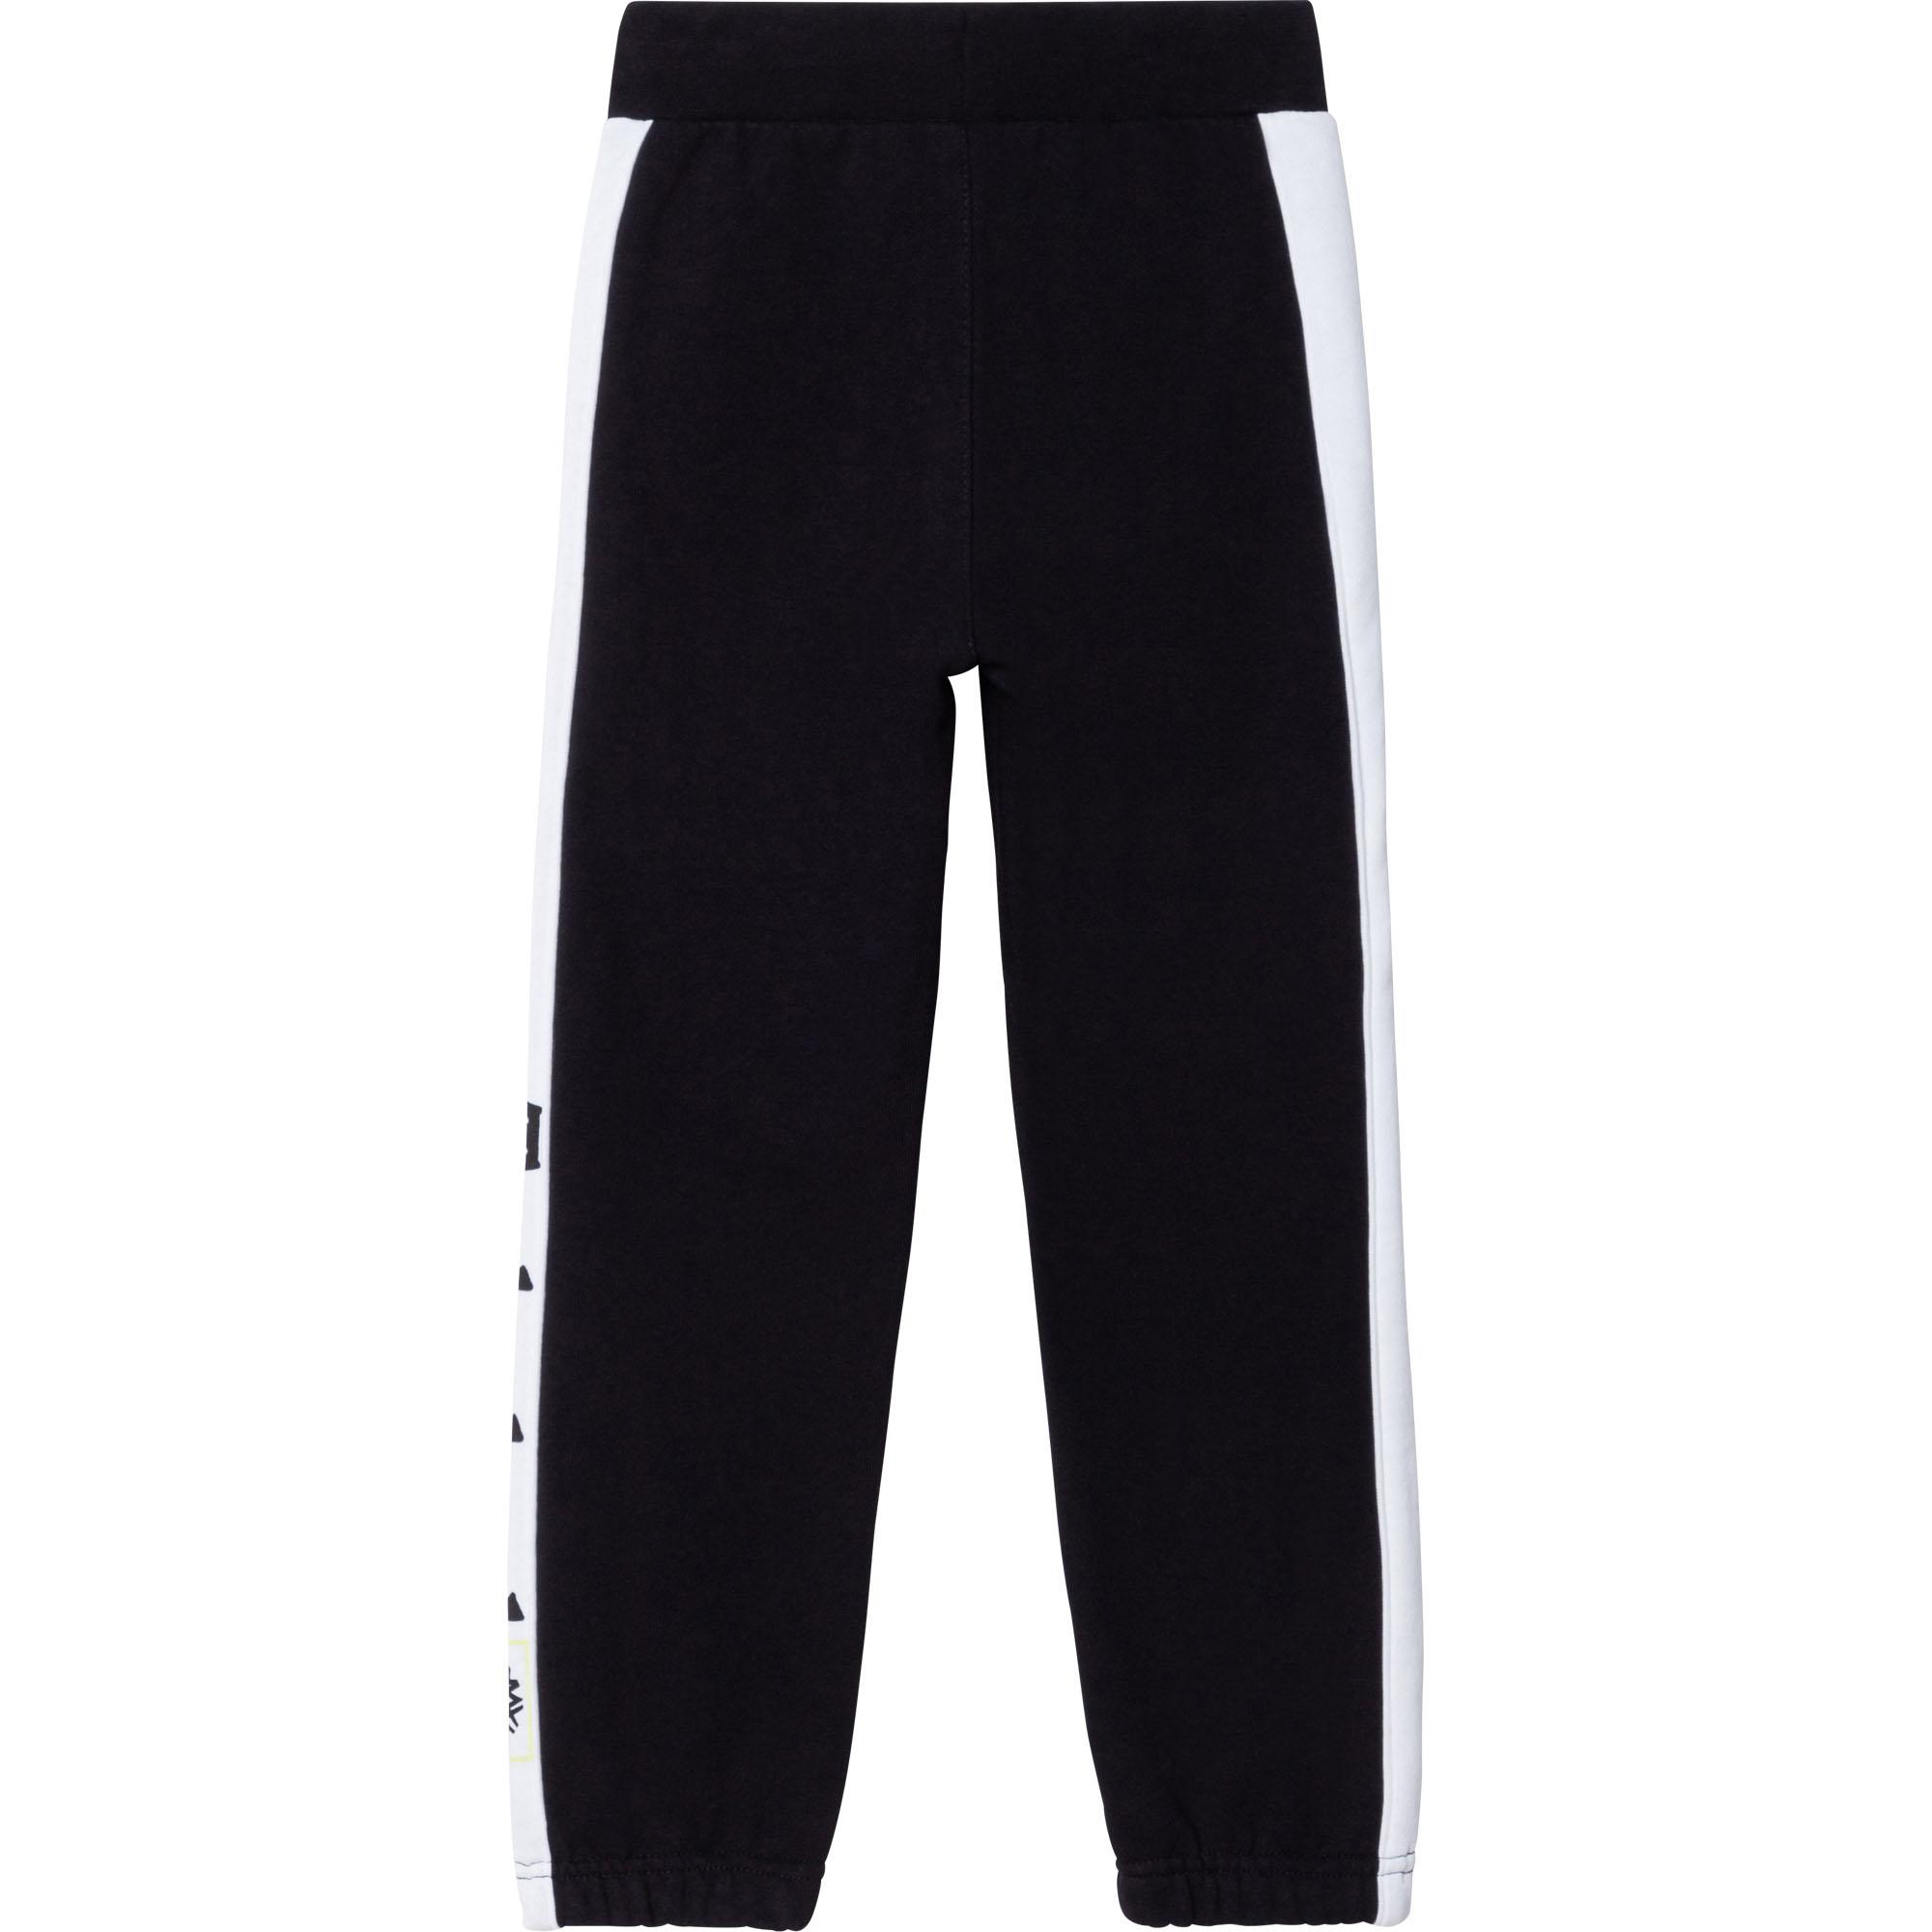 Pantalon de jogging molletonné TIMBERLAND pour GARCON